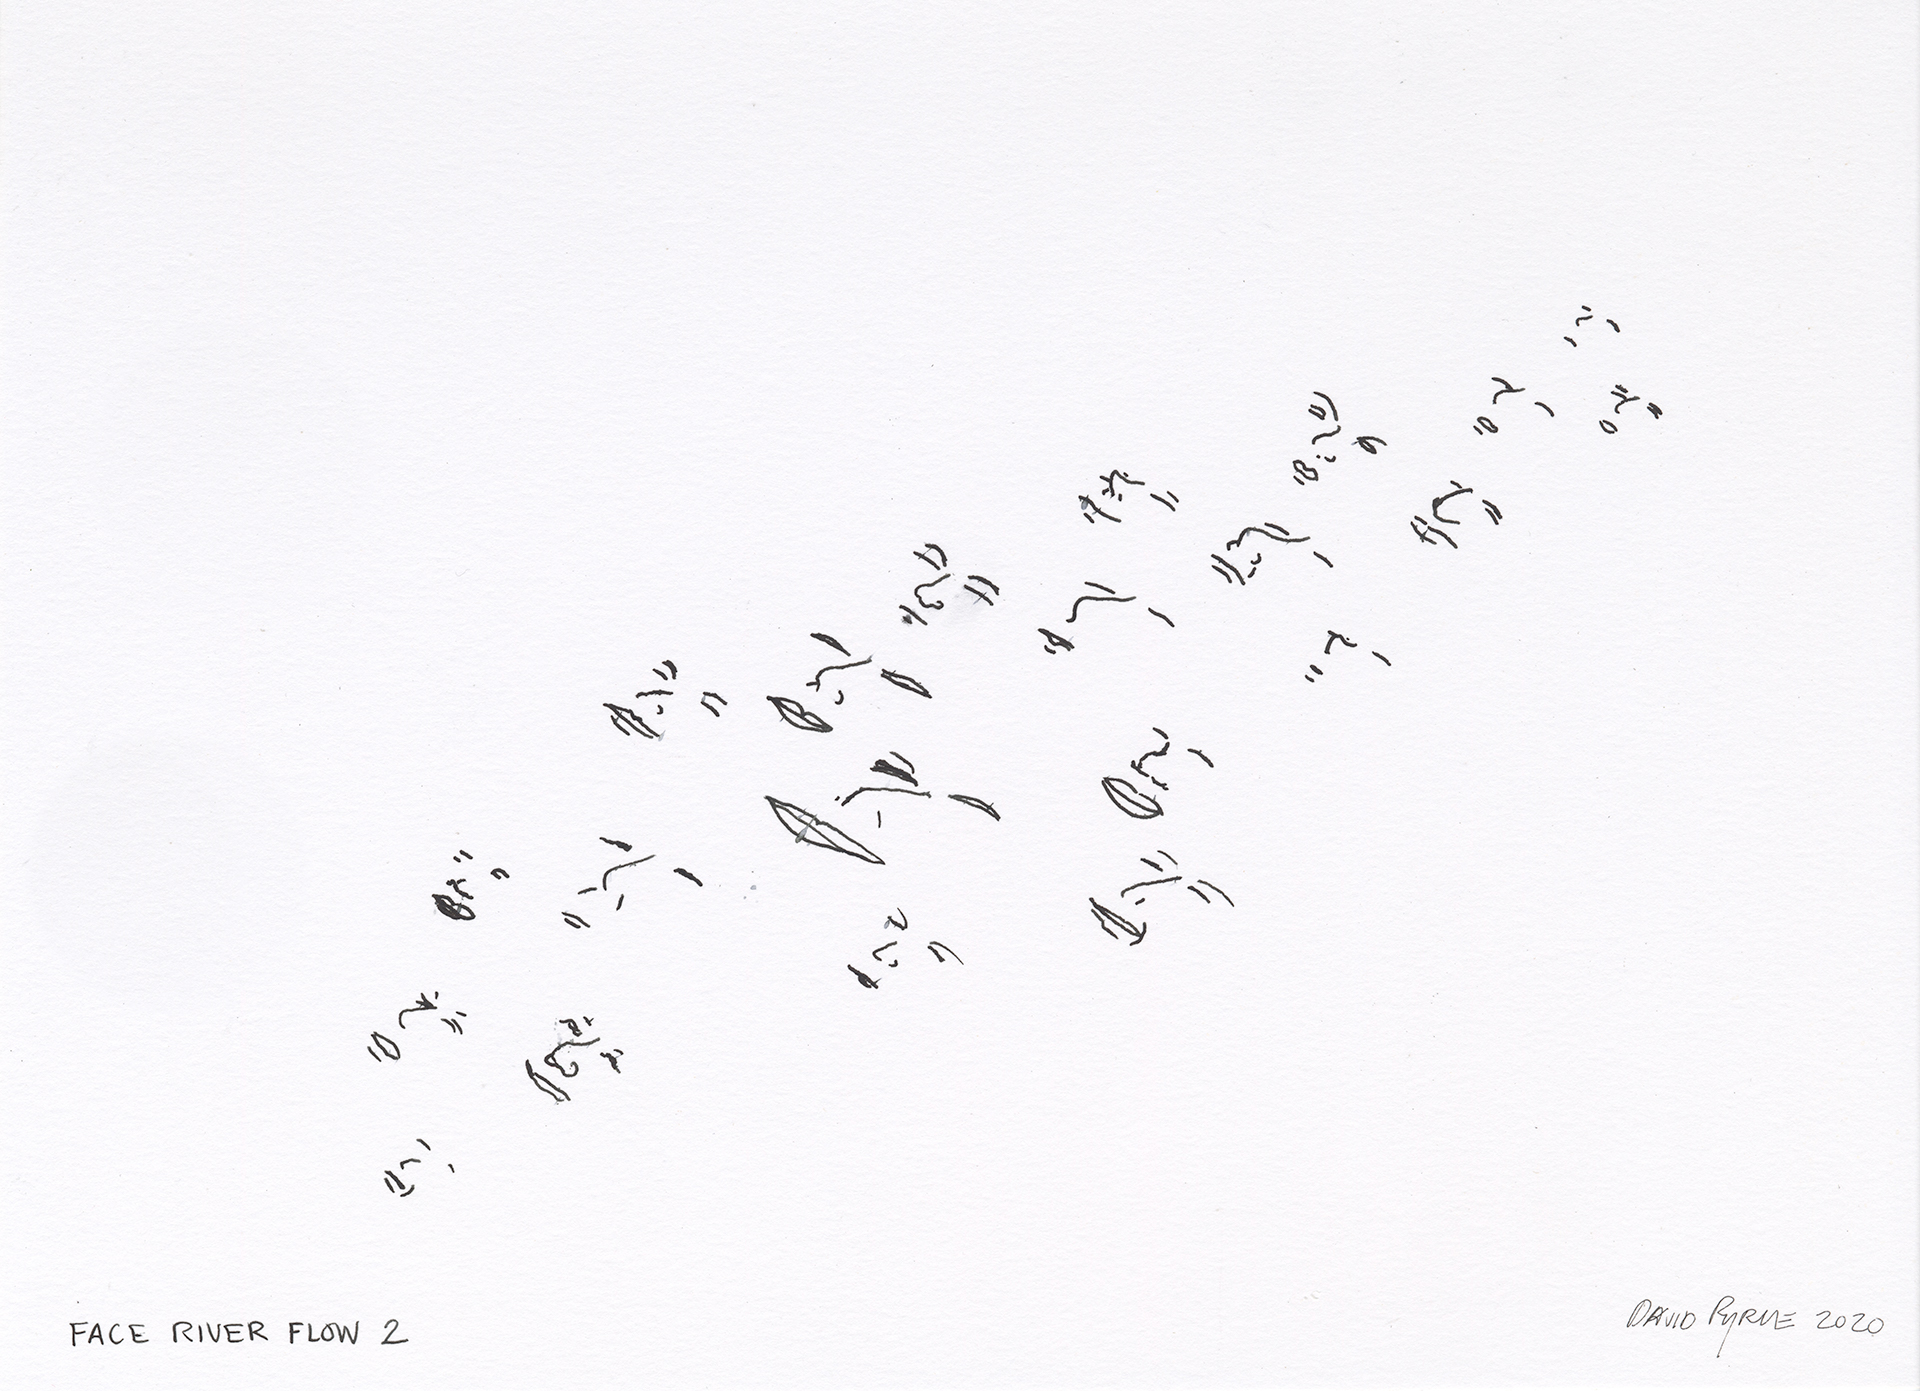 David Byrne illustrations